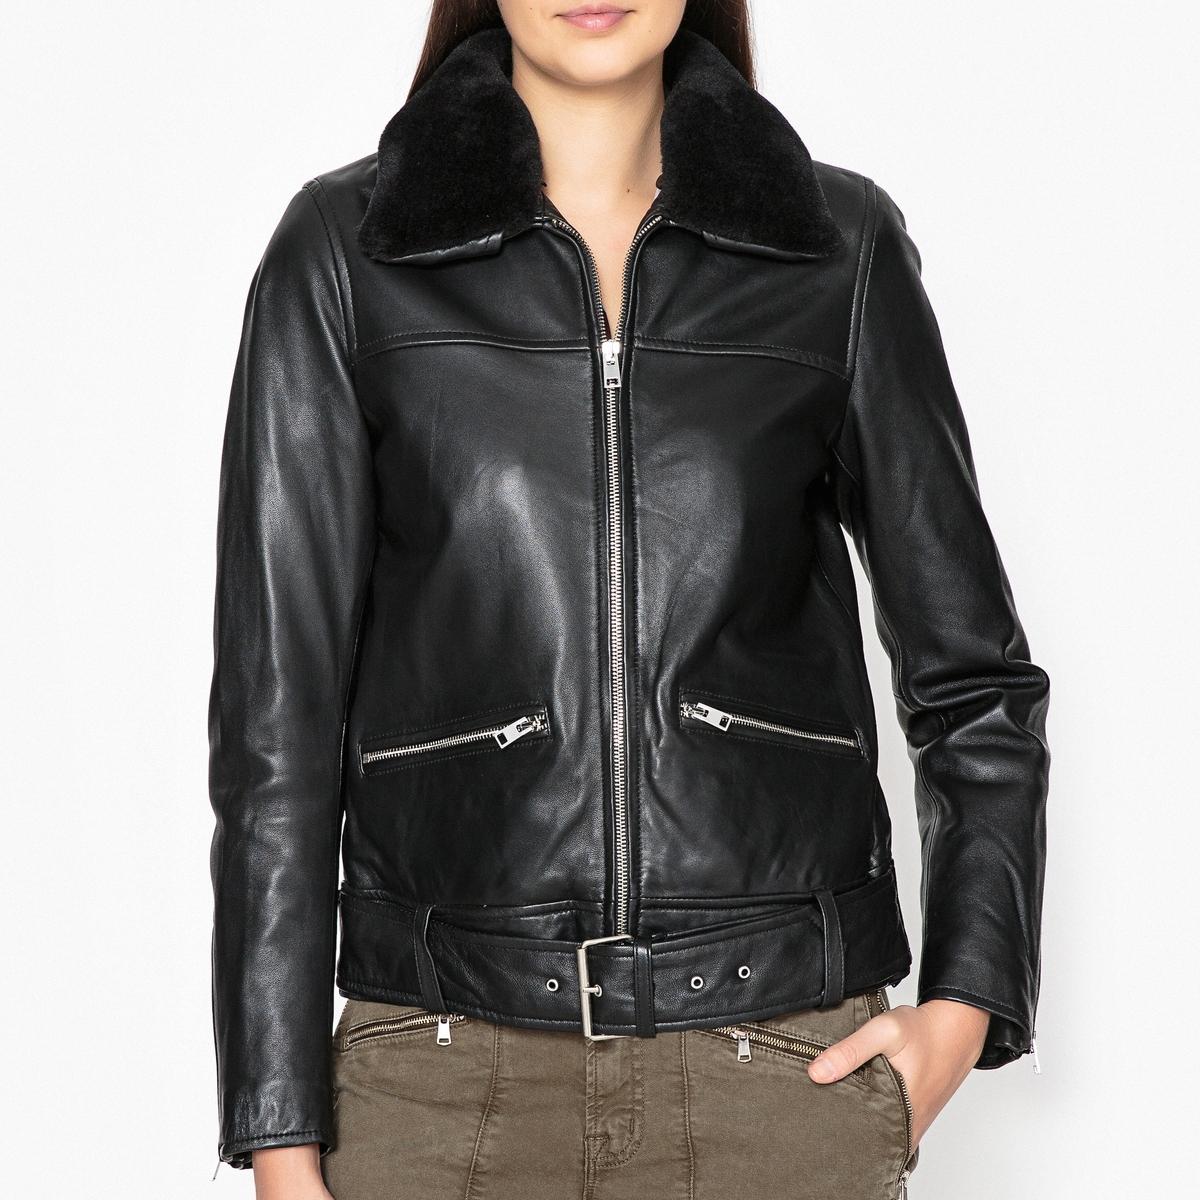 Блузон кожаный на молнии KART блузон кожаный на молнии в стиле летчика josh